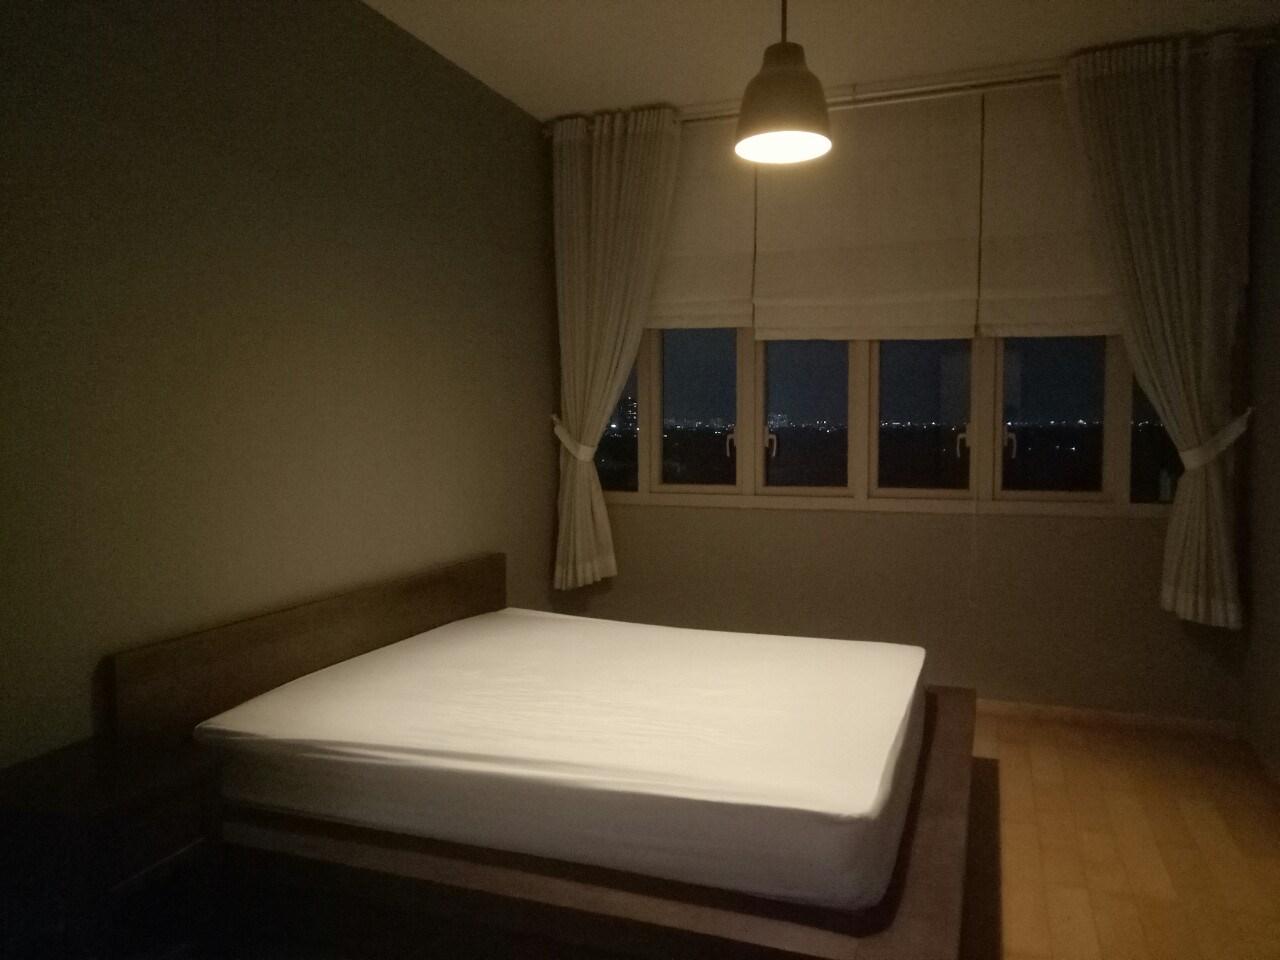 TV90837 - Apartment for rent - The Vista  - 2 bedroom